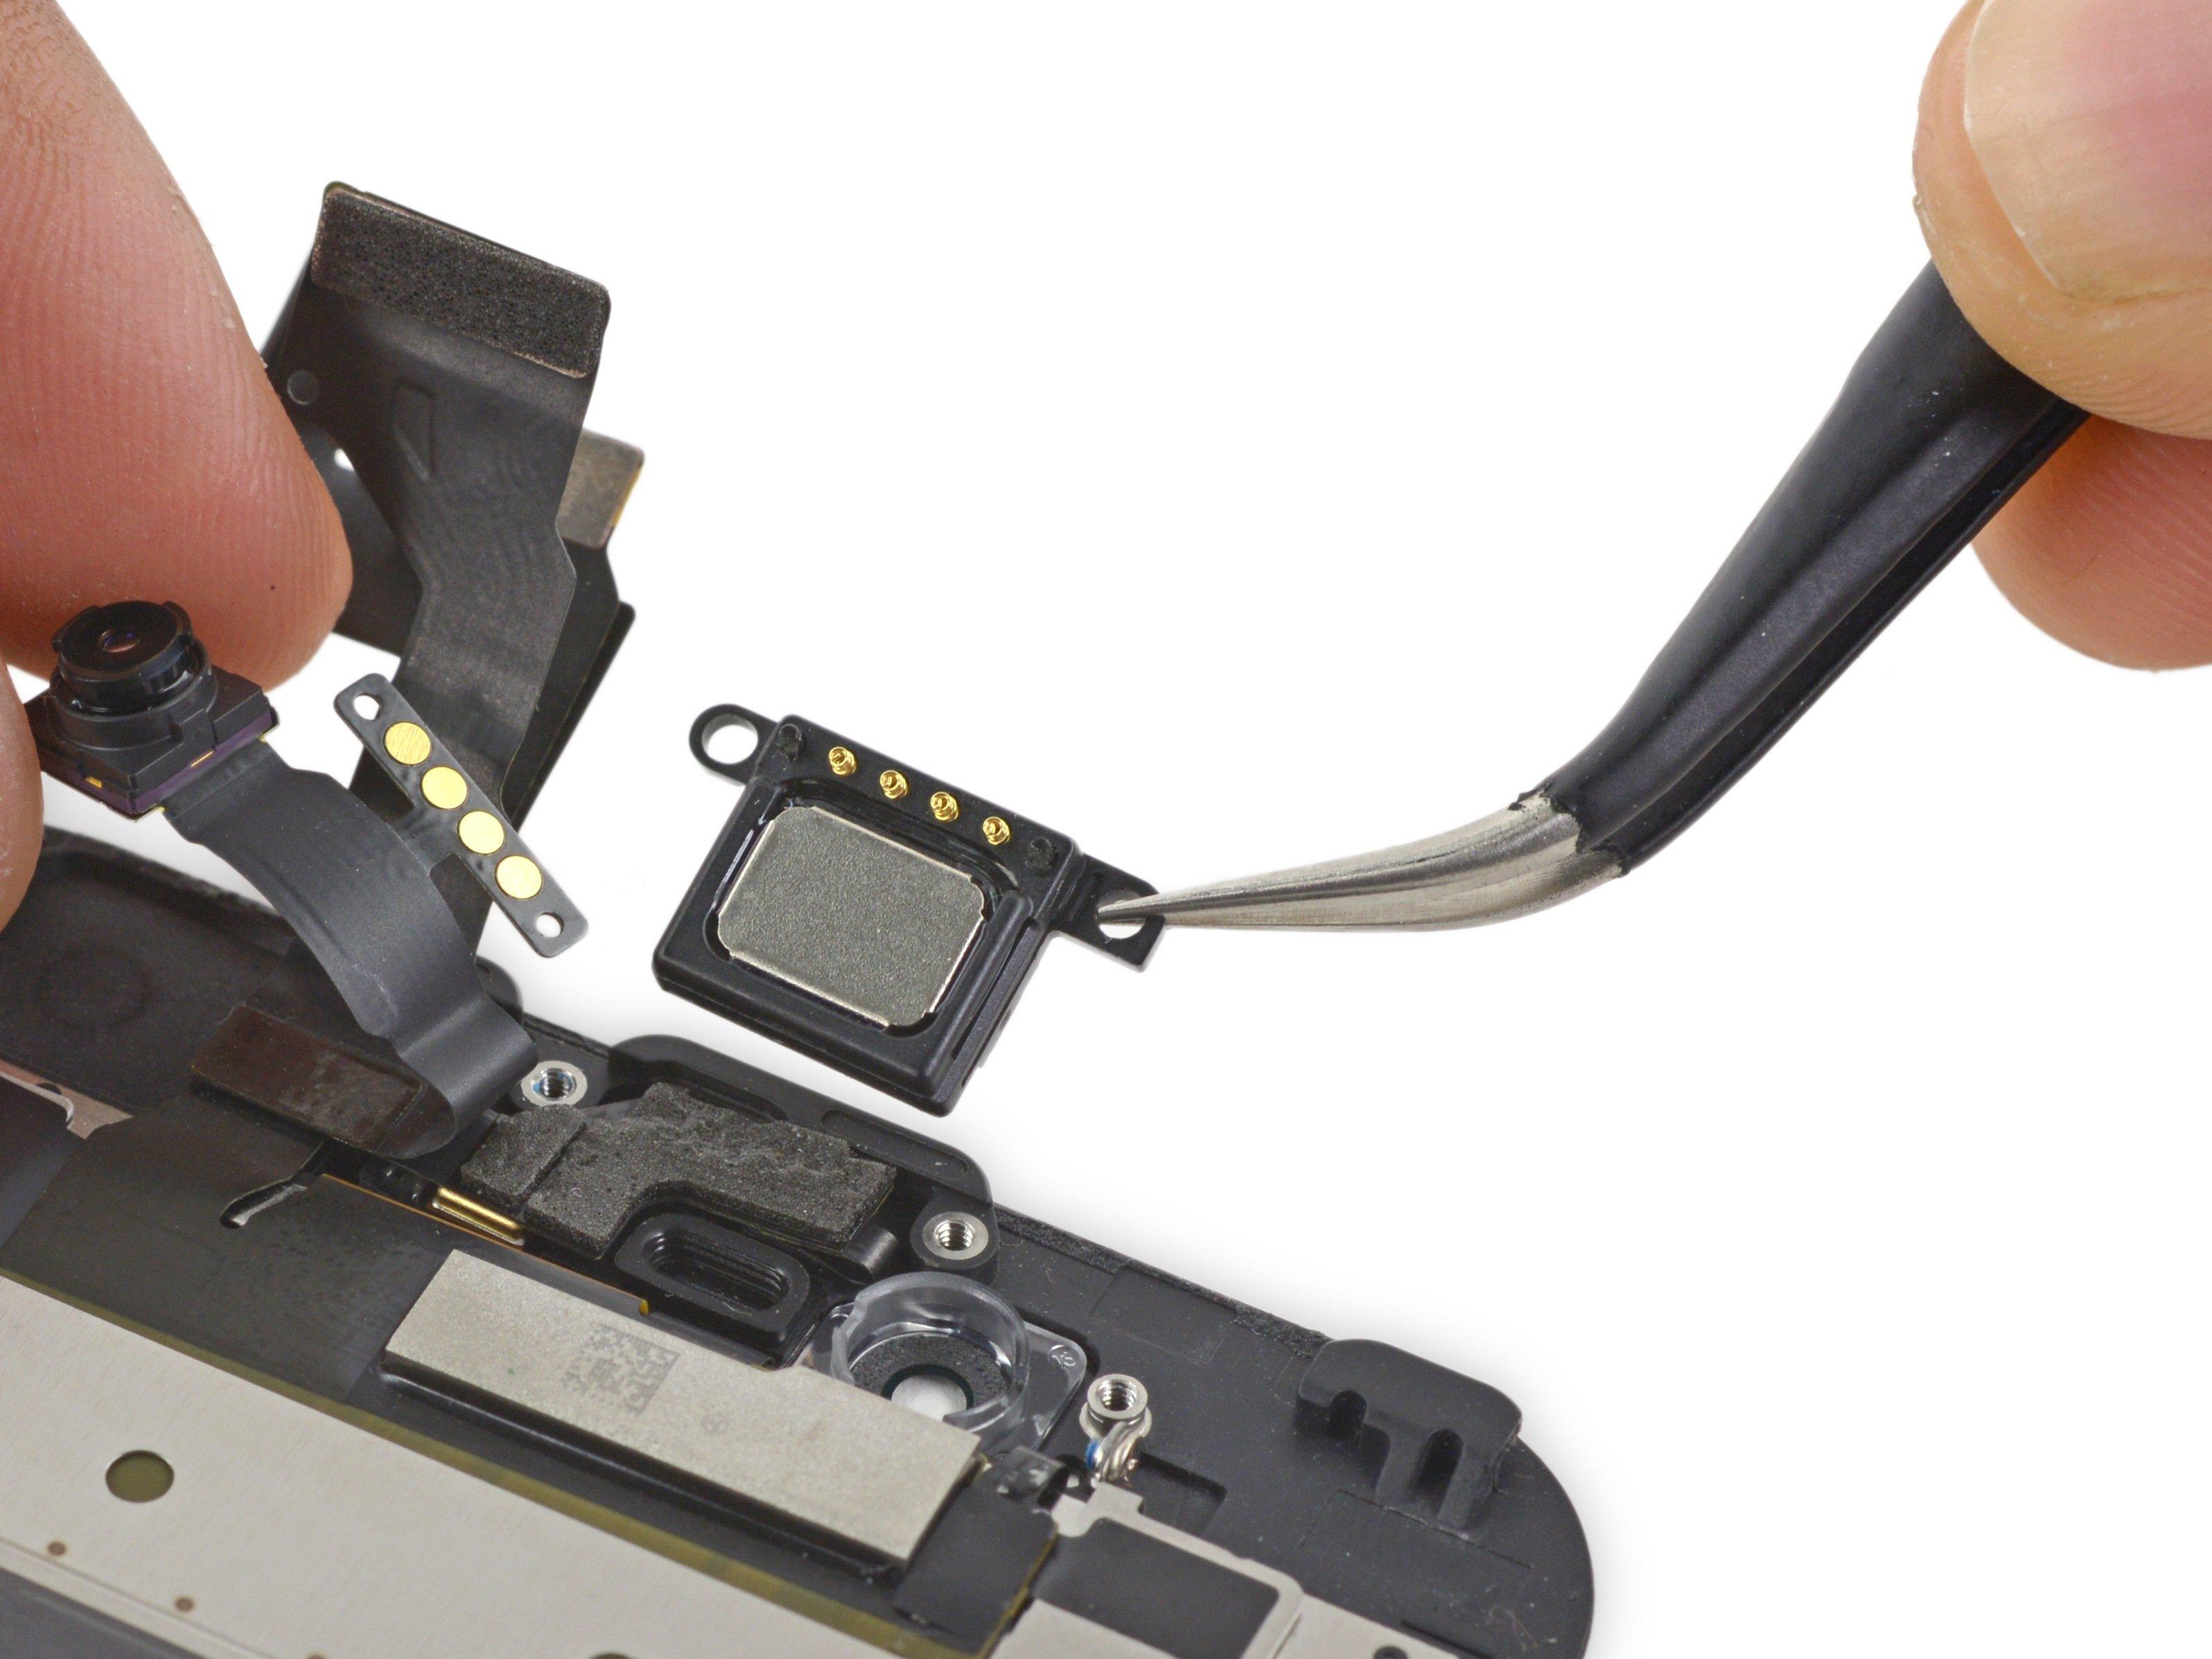 hot sales 9e879 cf114 iPhone 6s Earpiece Speaker Replacement - iFixit Repair Guide